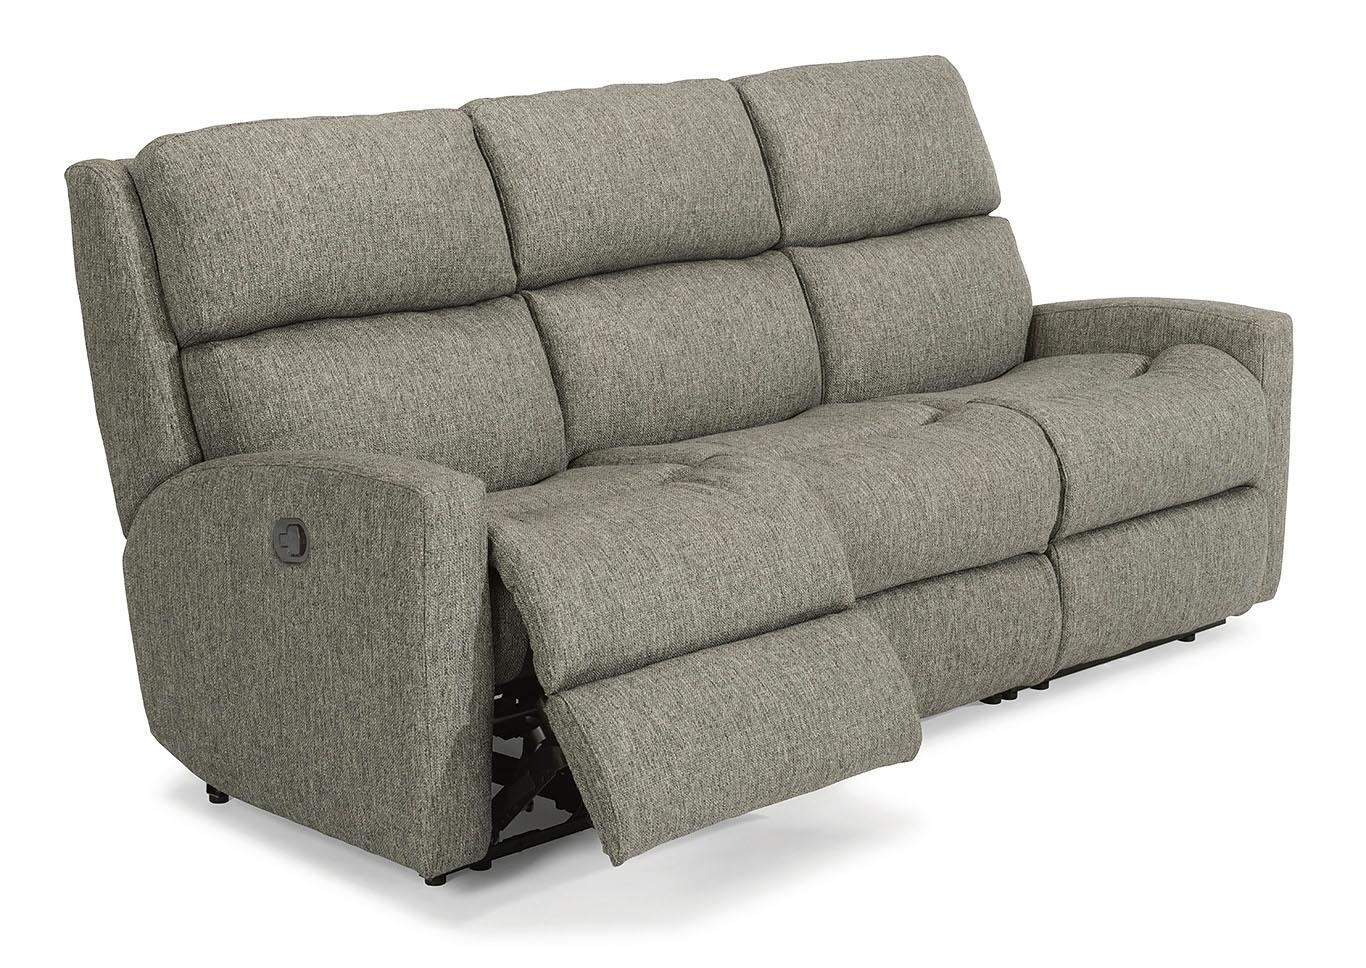 Catalina Fabric Reclining Sofa Sofas 2 Furnishings